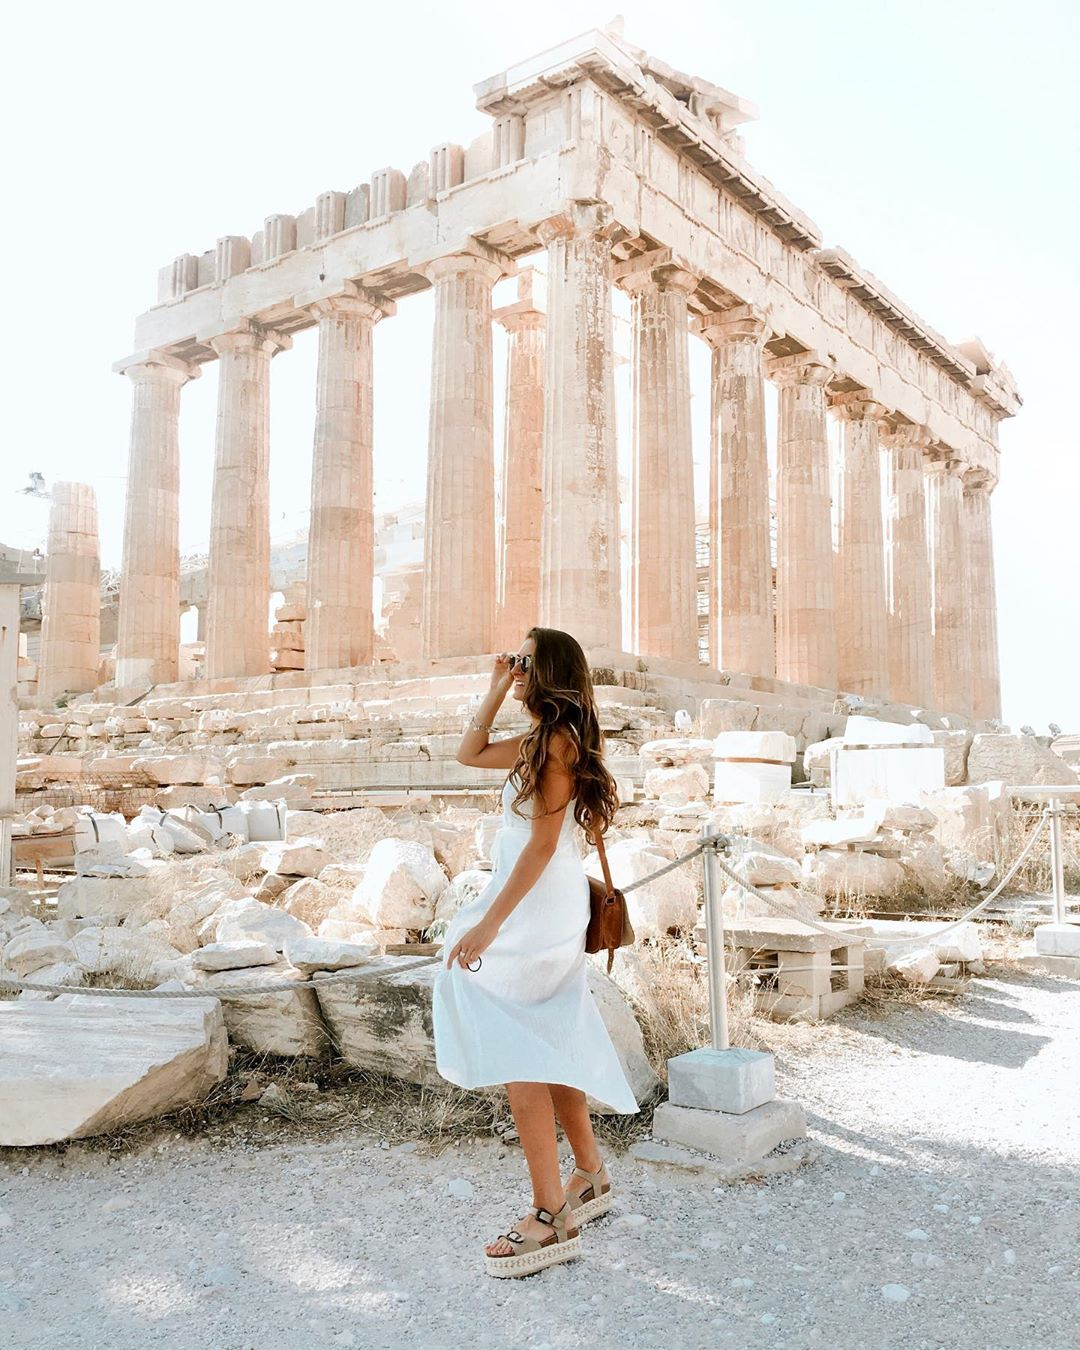 афины греция путешествие